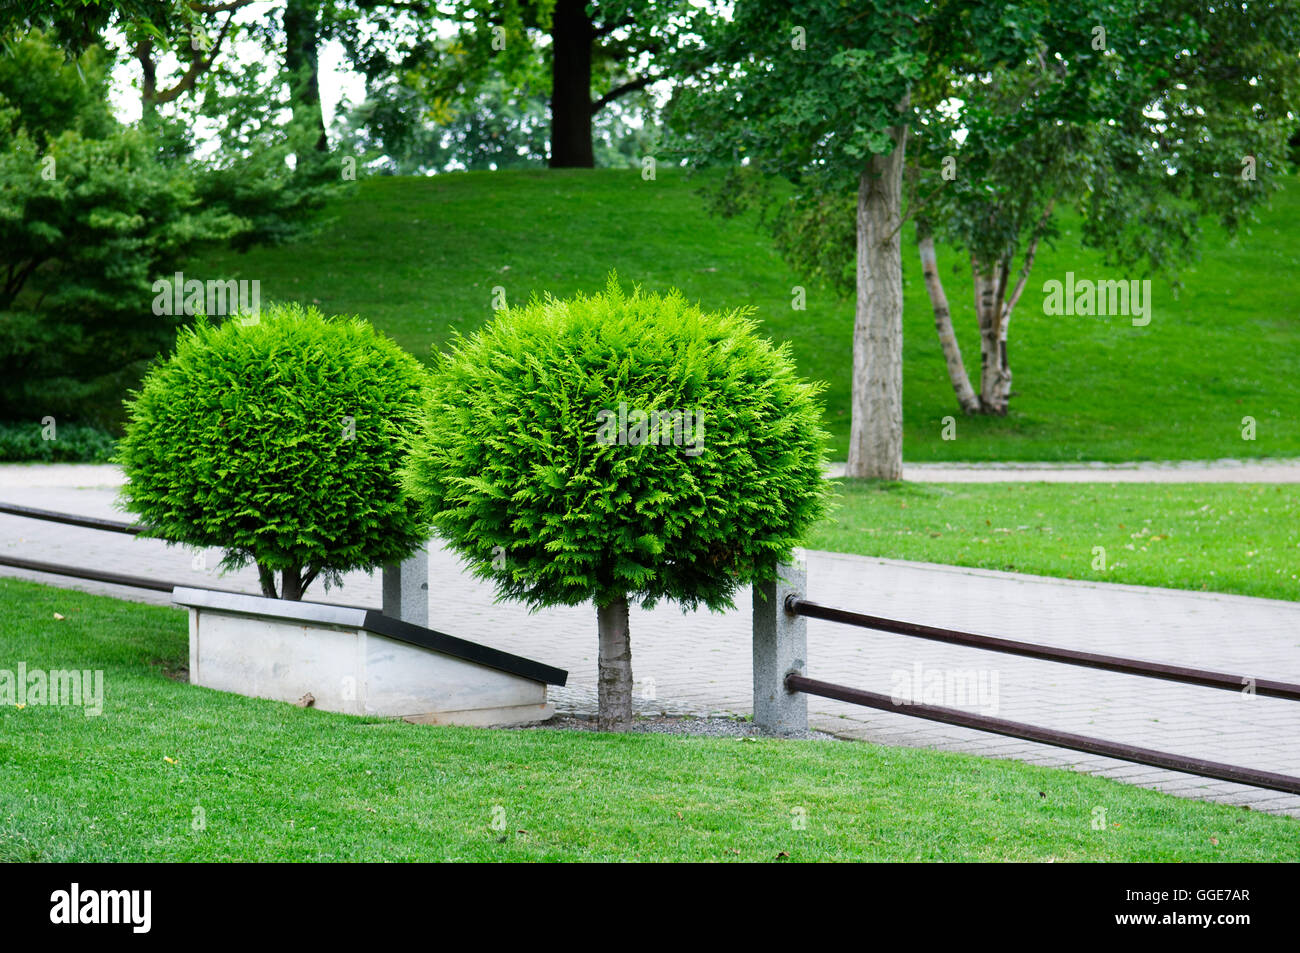 small spherical arborvitae in the park - Stock Image